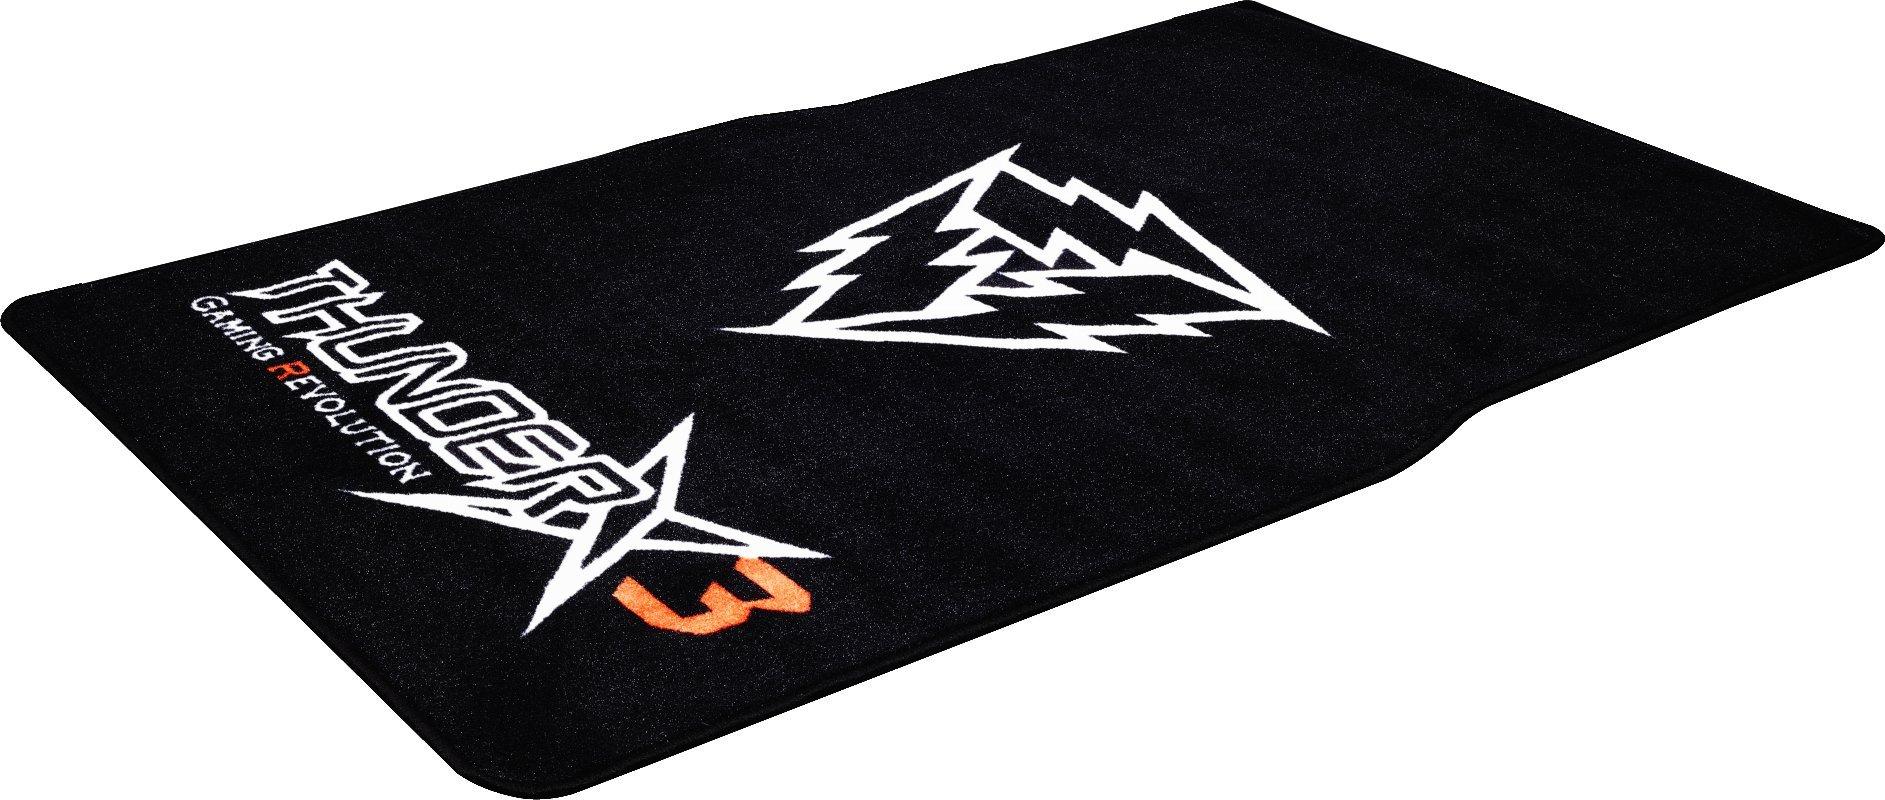 ThunderX3 TGM20- Alfombra para Silla Profesional Gaming- (Antideslizante, Confortable, Fácil de Lavar) Color Negro